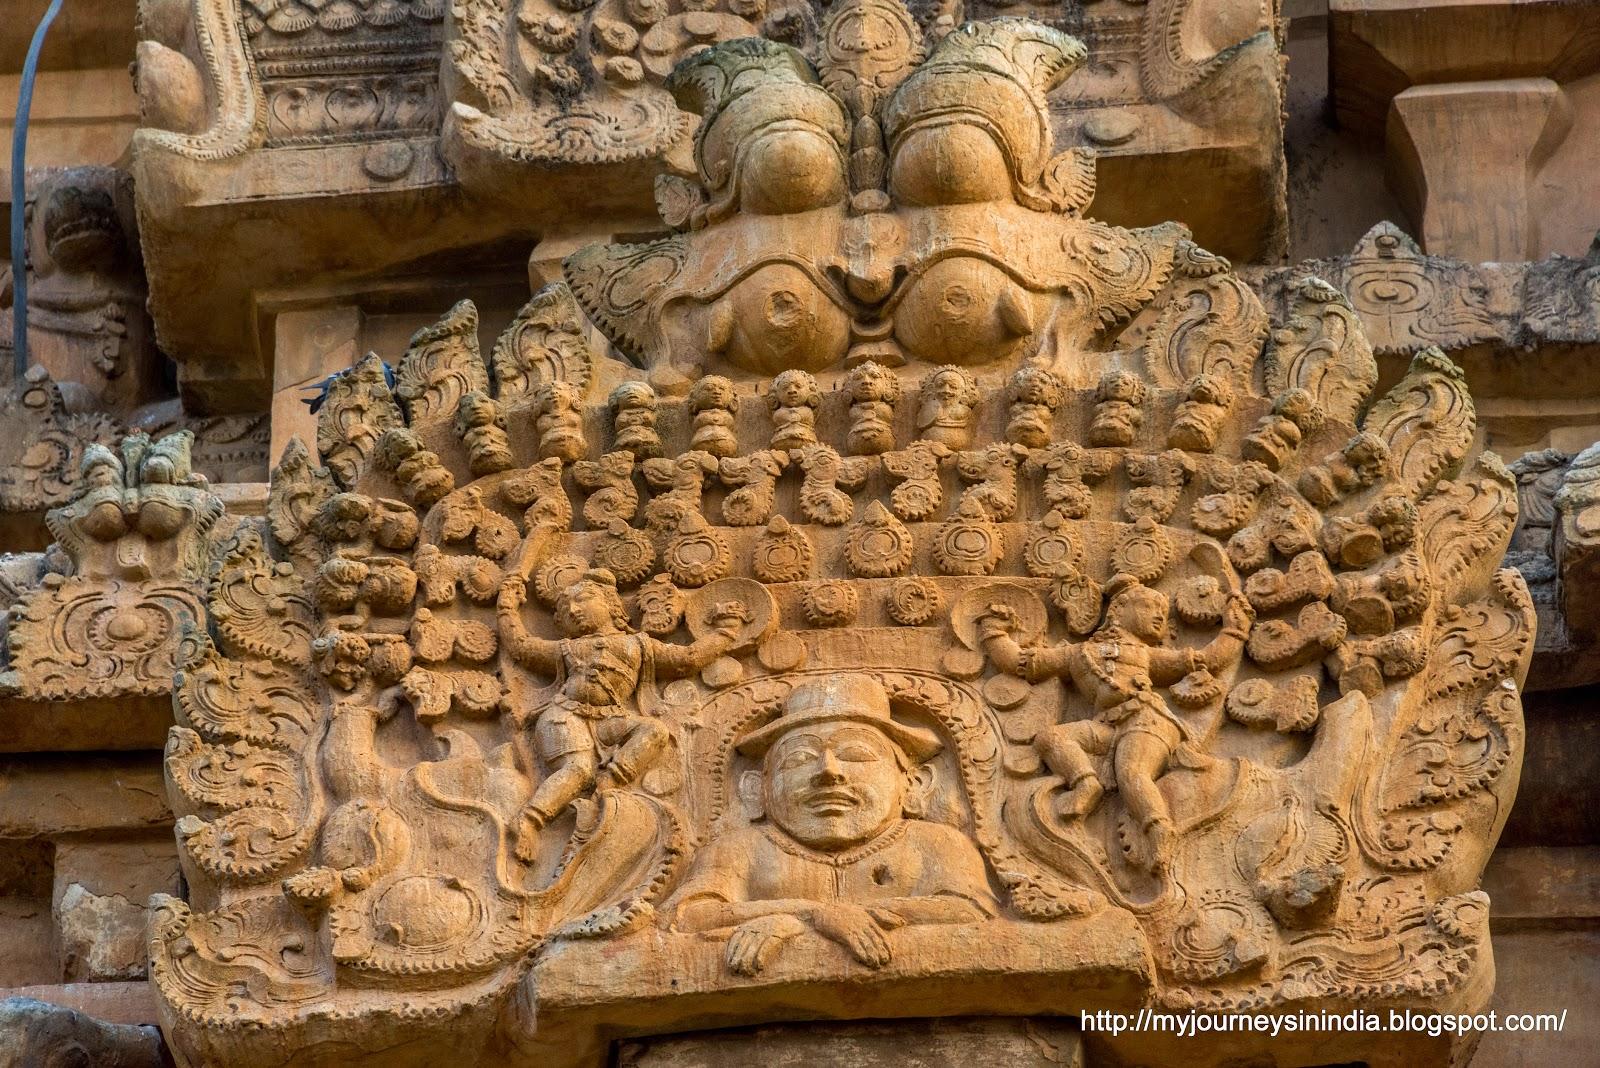 Thanjavur Brihadeeswarar Temple Tower sculptures